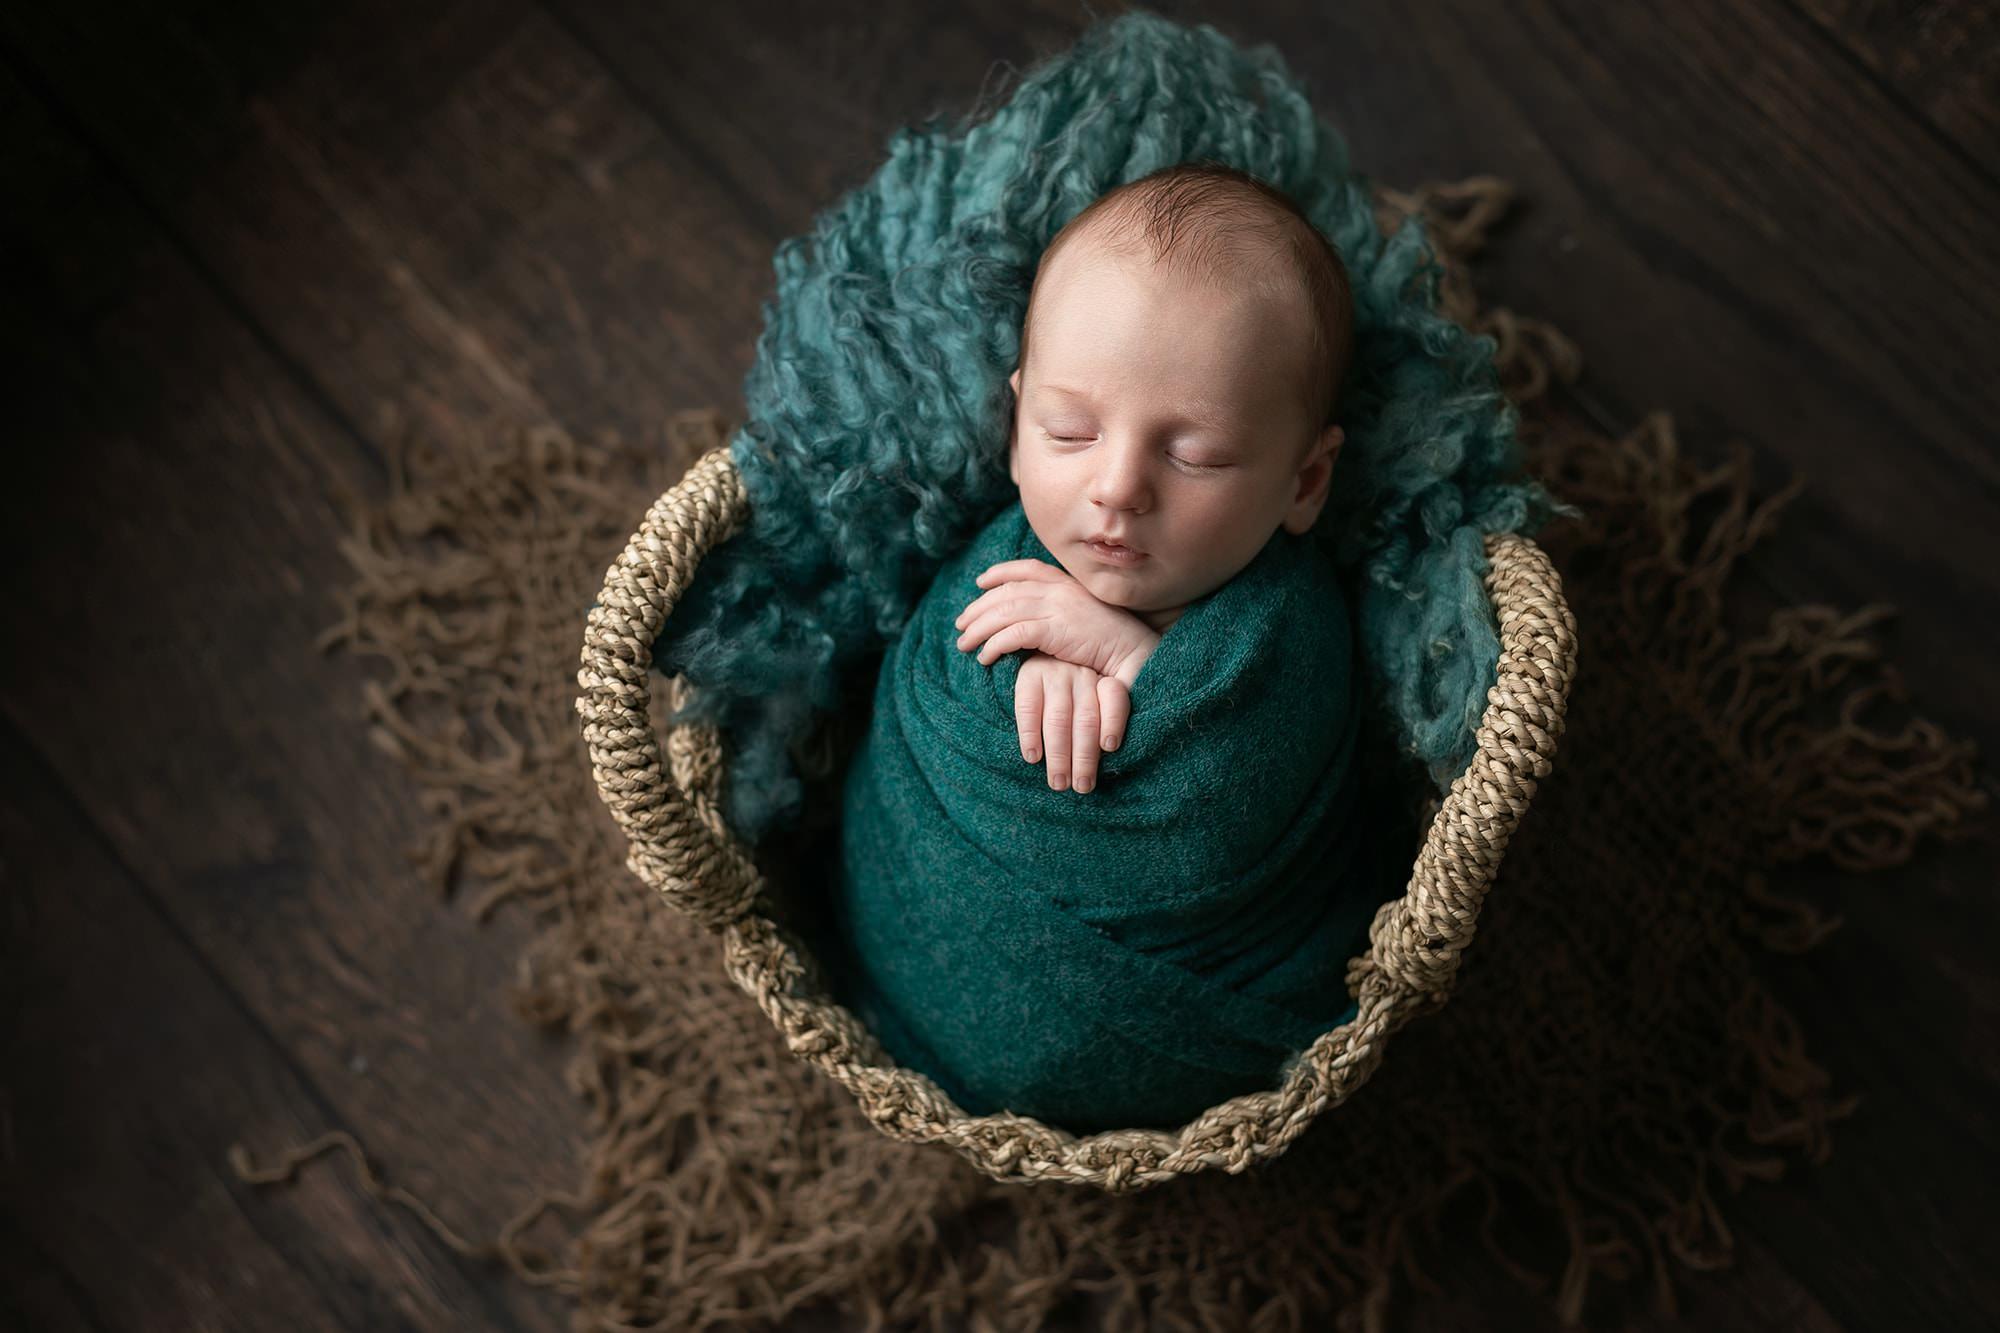 Baby boy wrapped in jade green in a basket on green fur, sat on dark wooden floor. Picture taken by Glasgow  babyphotographer